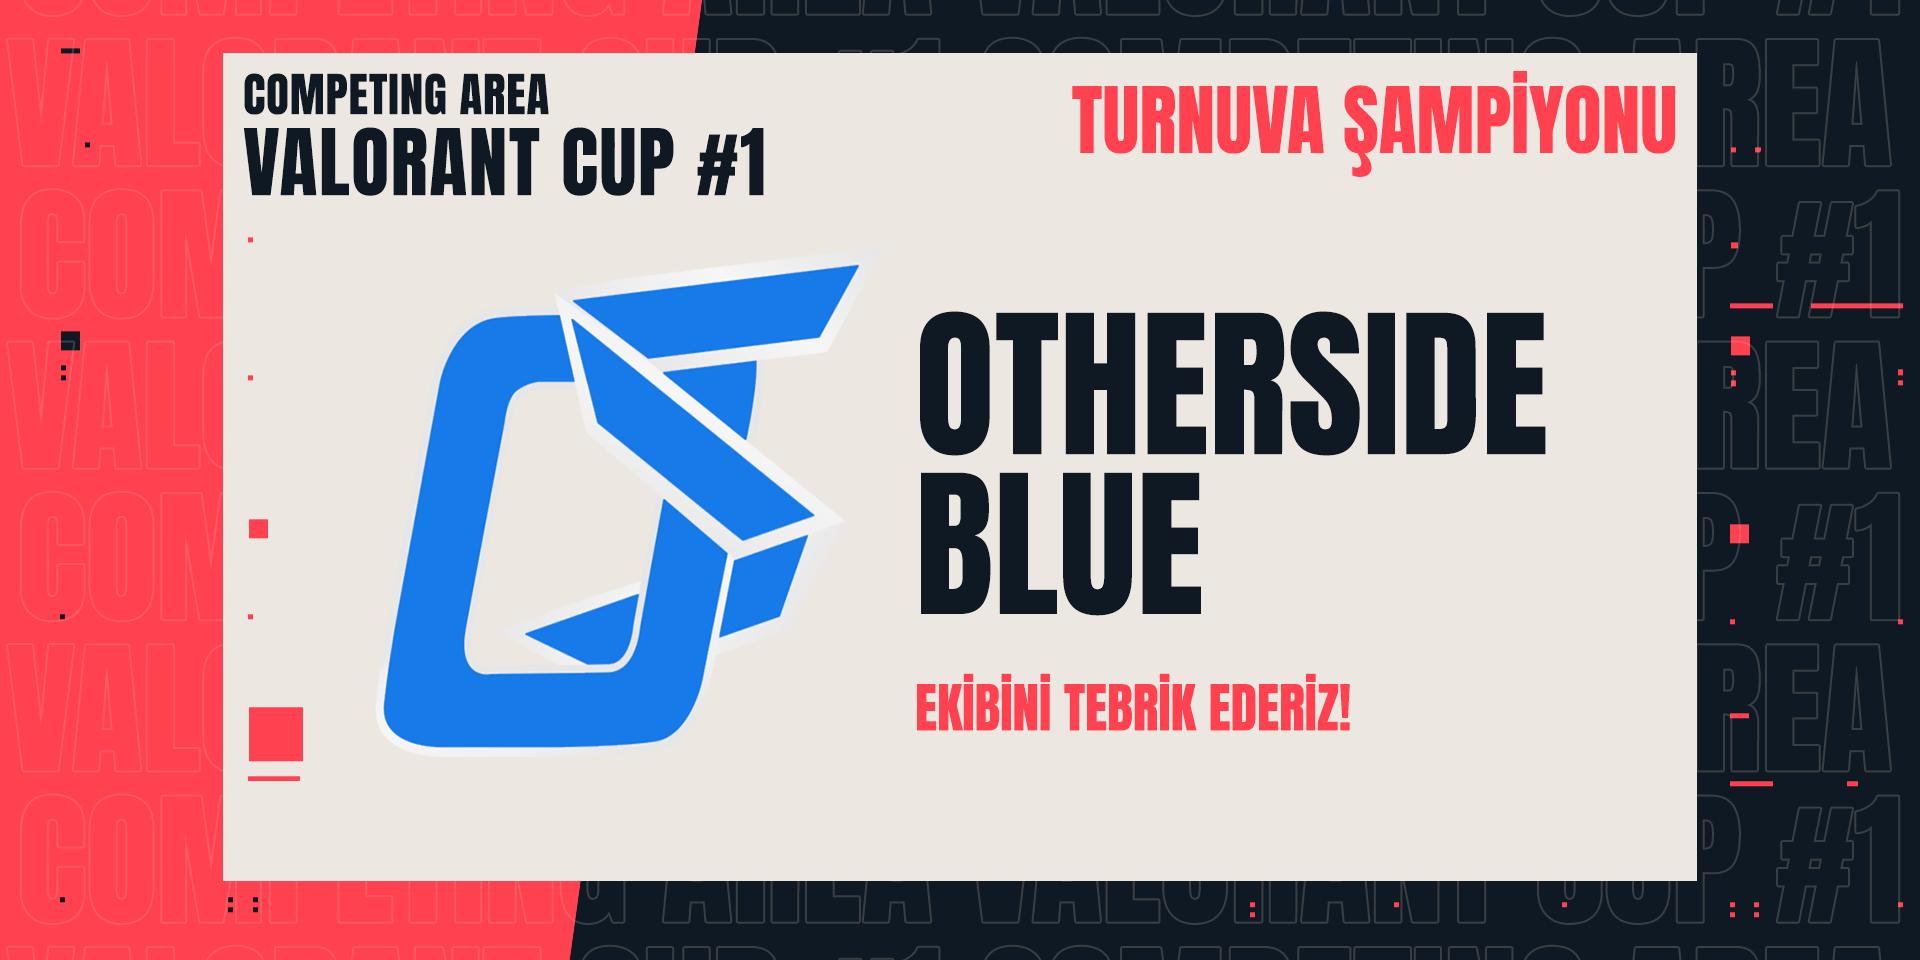 Şampiyon OTHERSIDE BLUE!